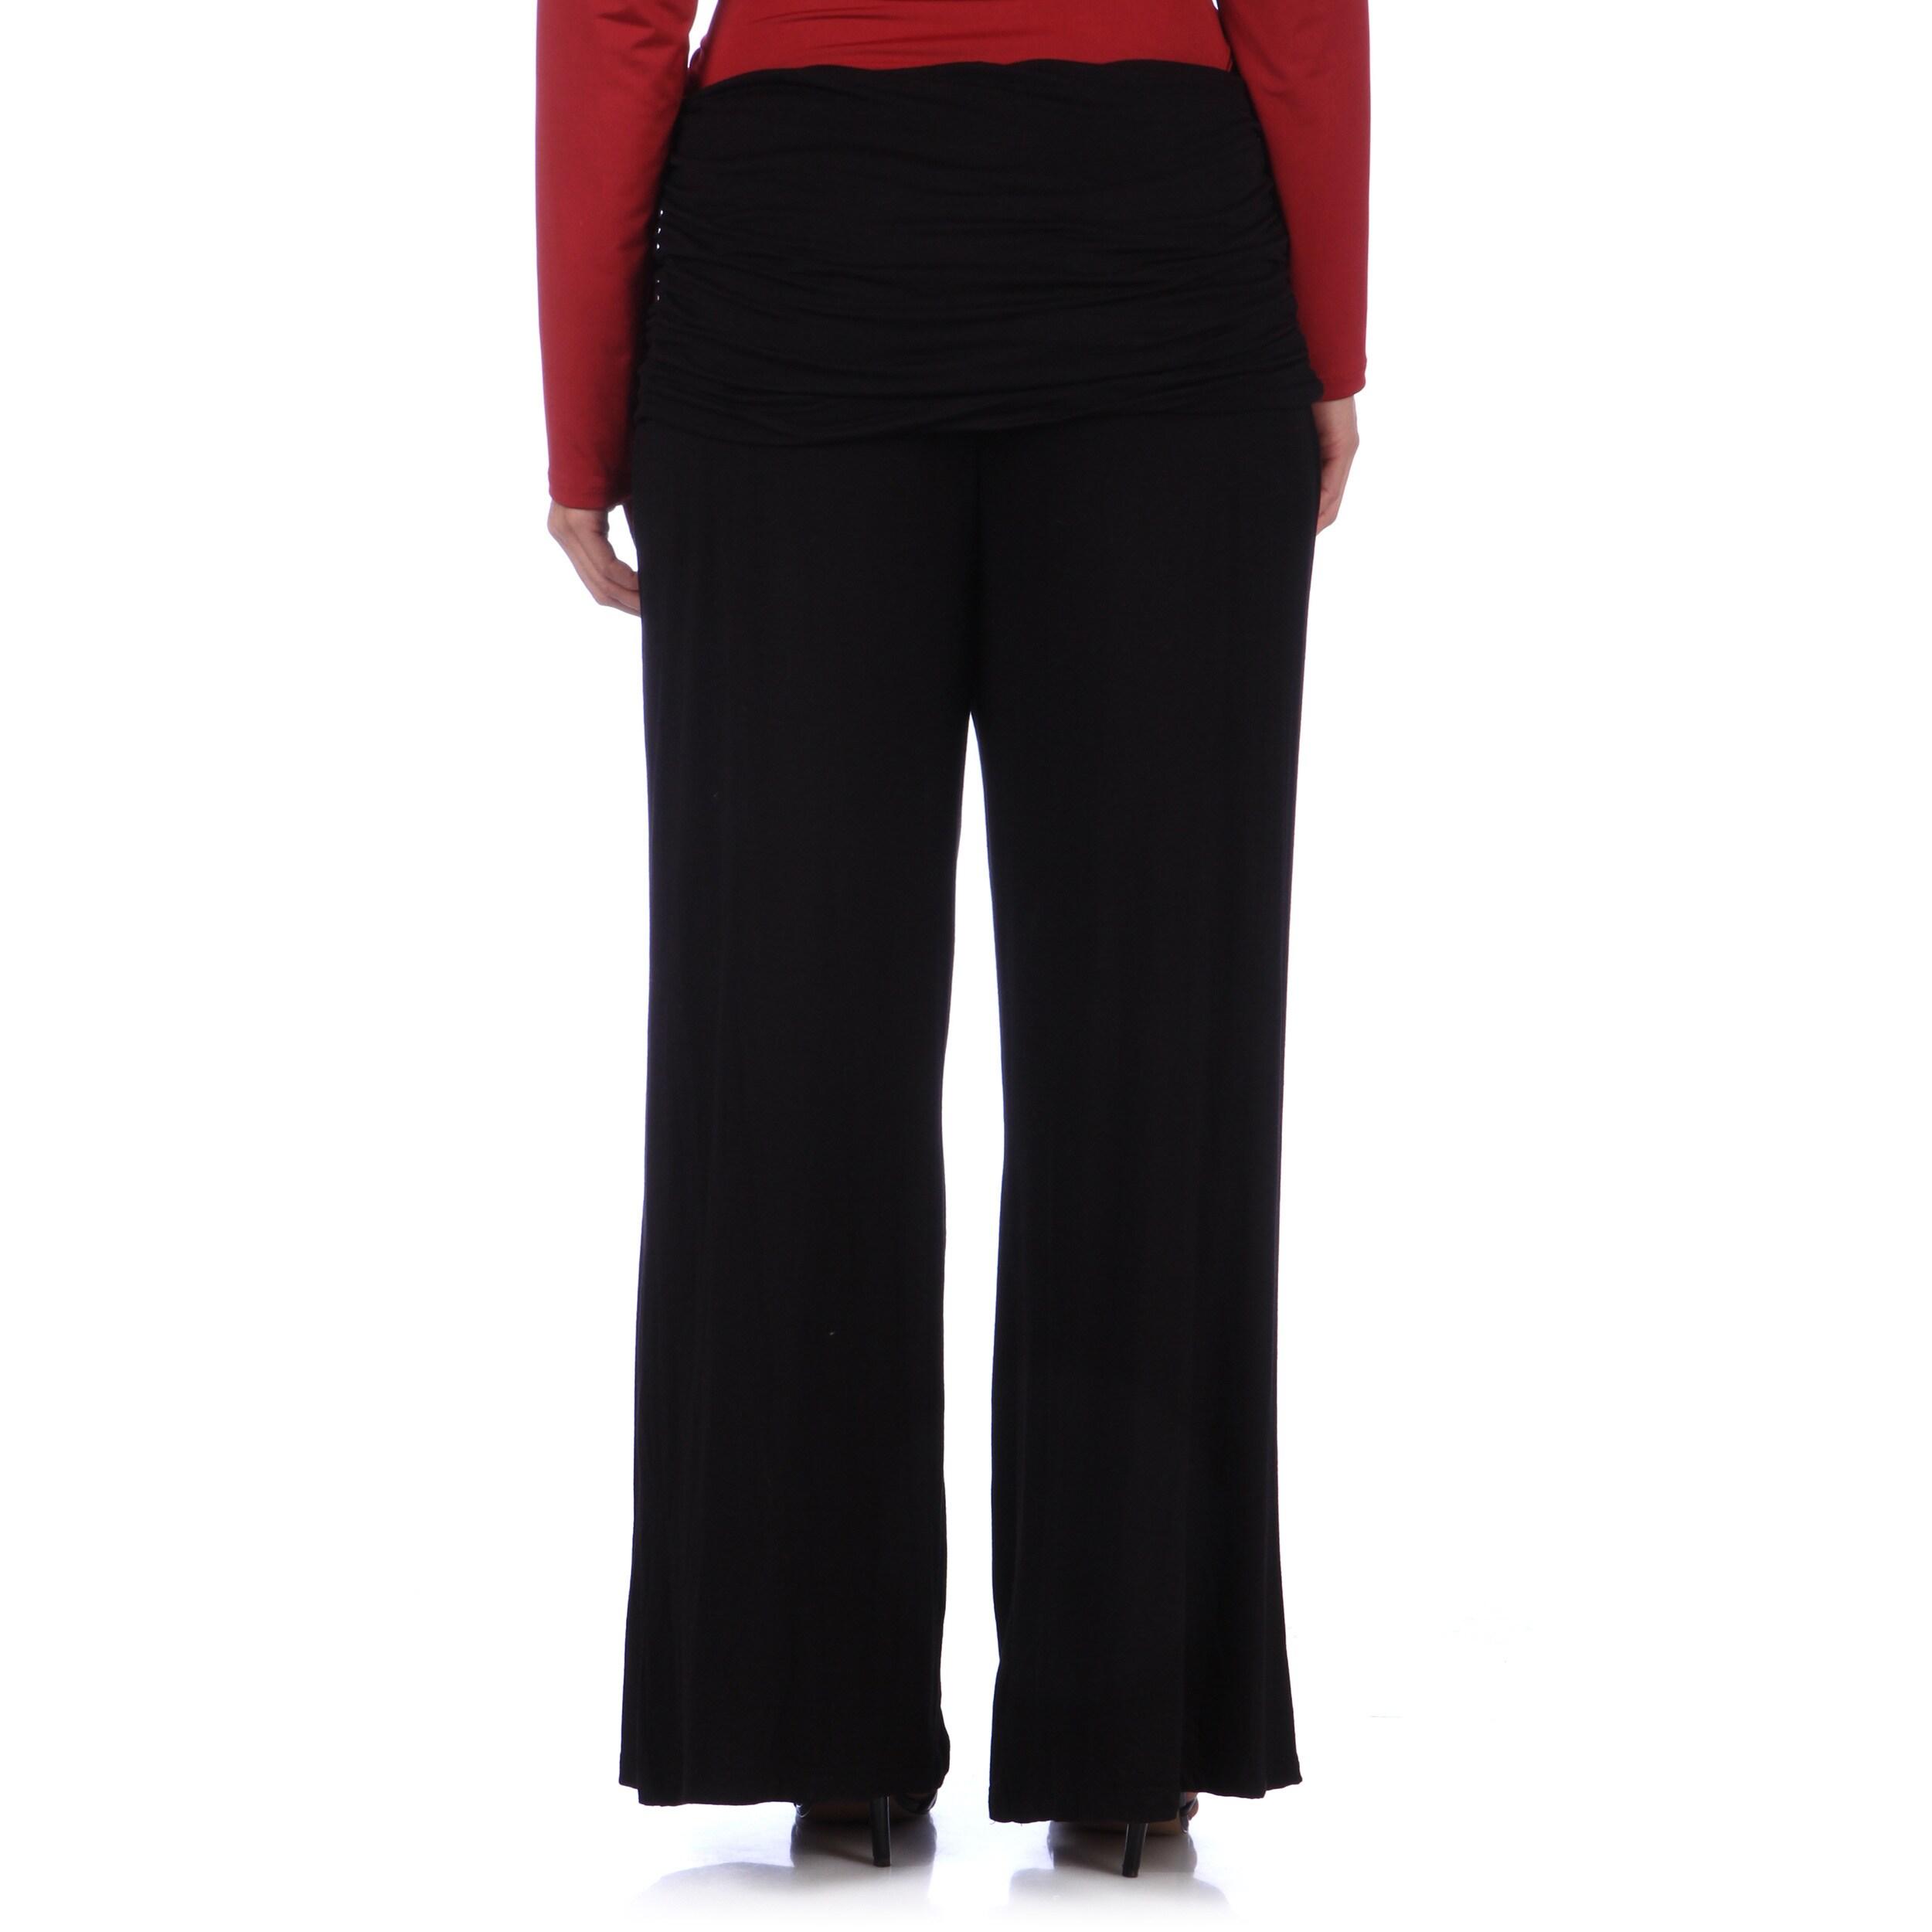 24/7 Comfort Apparel Women\'s Plus Size Wide-leg Palazzo Pants